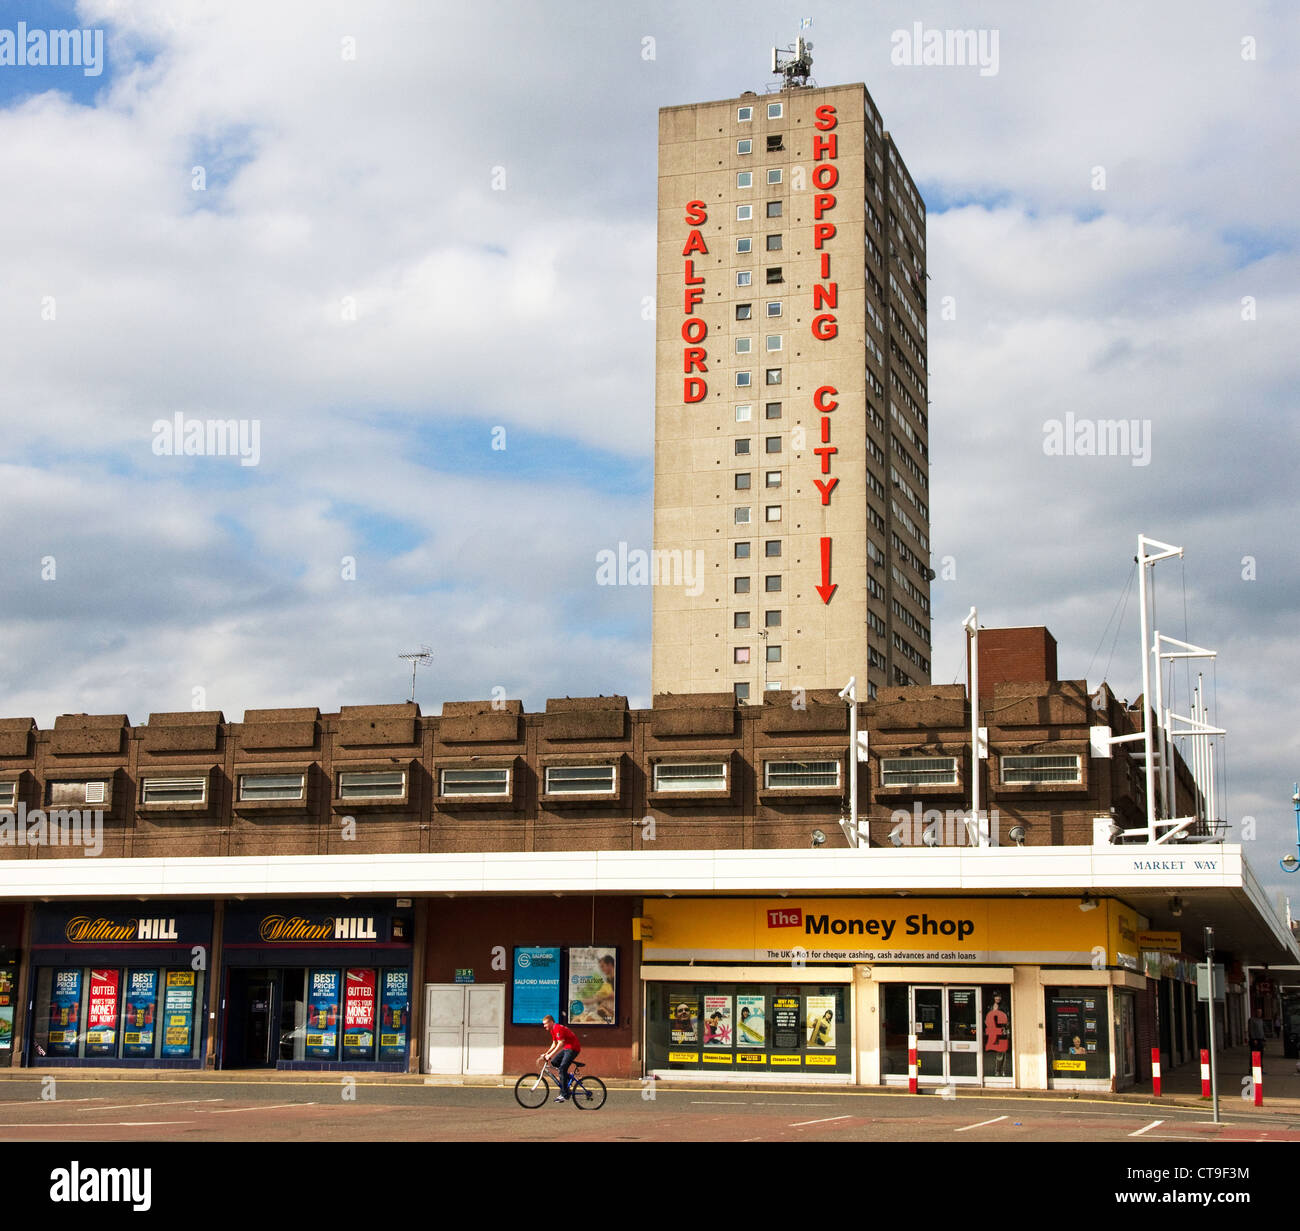 Salford City: Salford Shopping City, Salford, Greater Manchester. UK